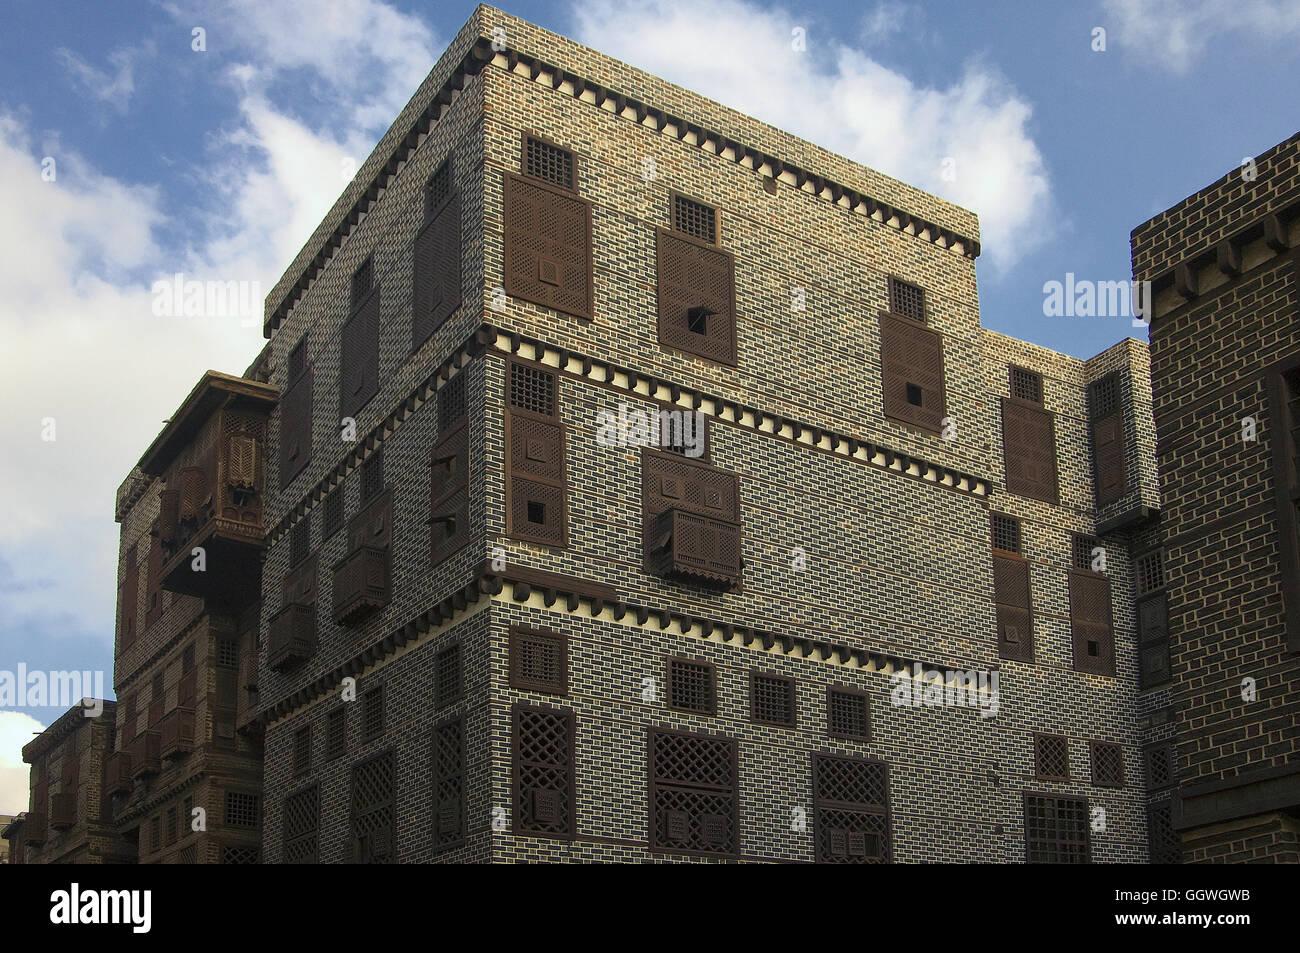 Rosetta Stone Requires Elevation Windows : Shutters brick building facade stock photos